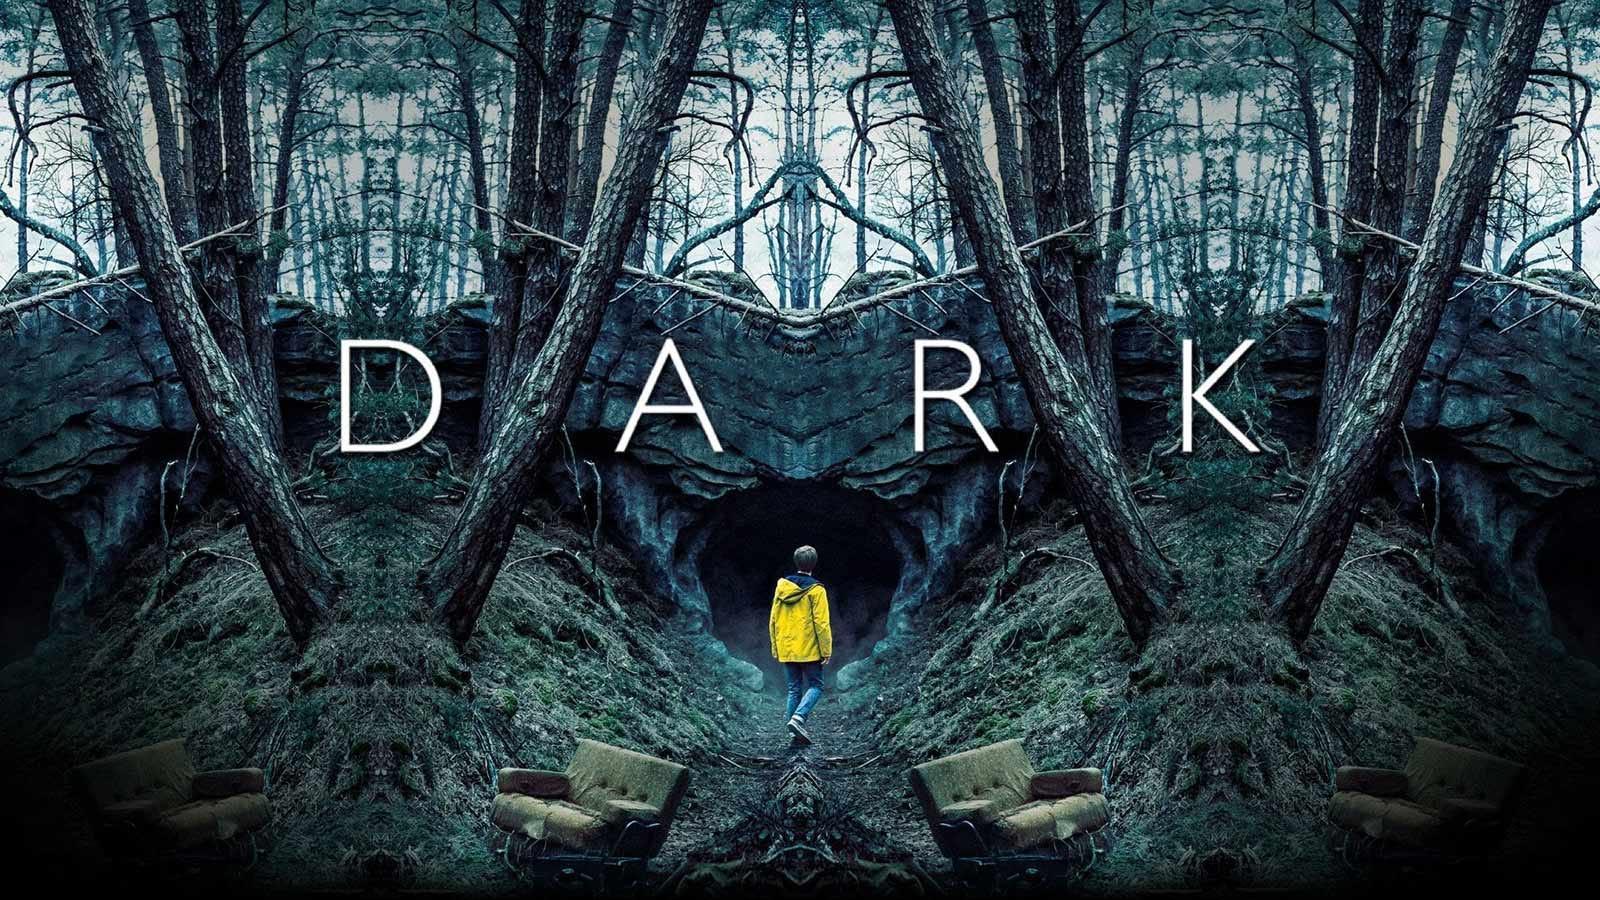 A boy in a yellow rain slicker walks towards an eerie cave opening.